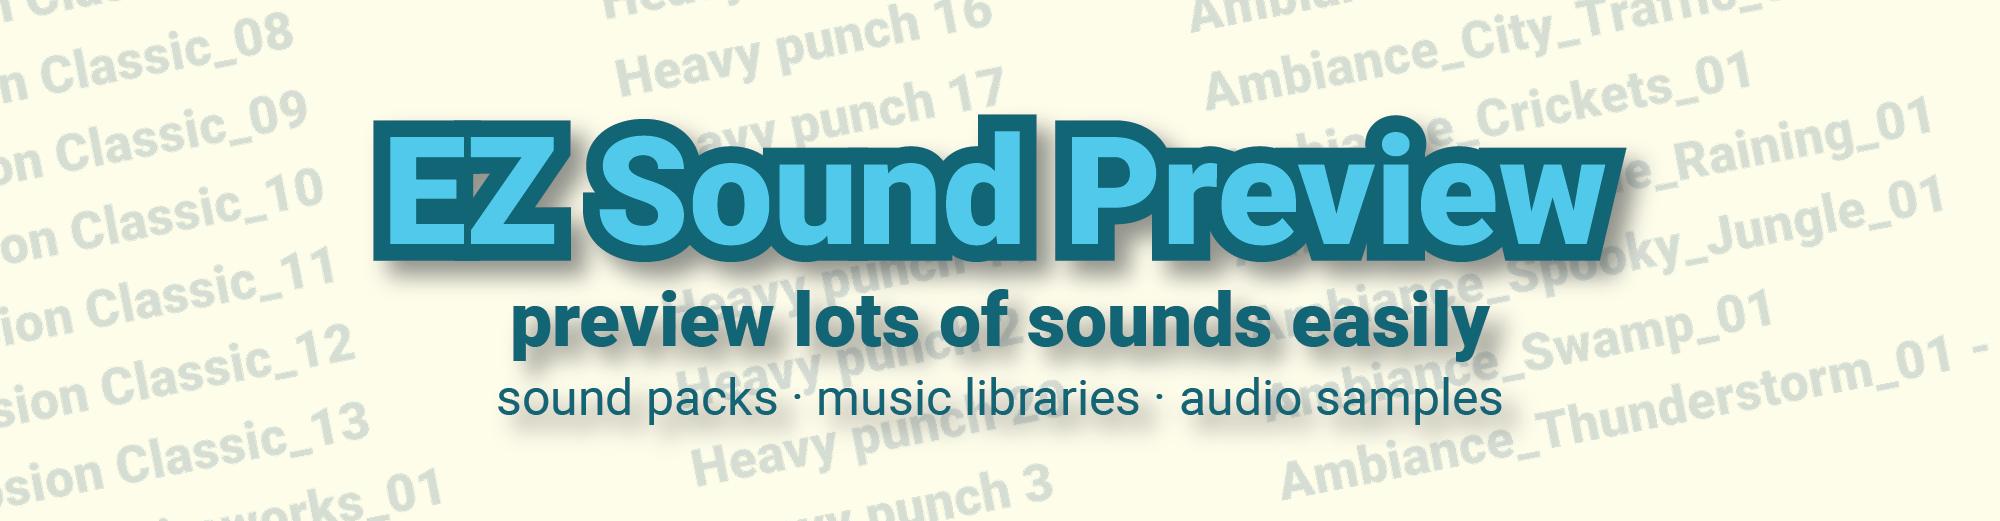 EZ Sound Preview